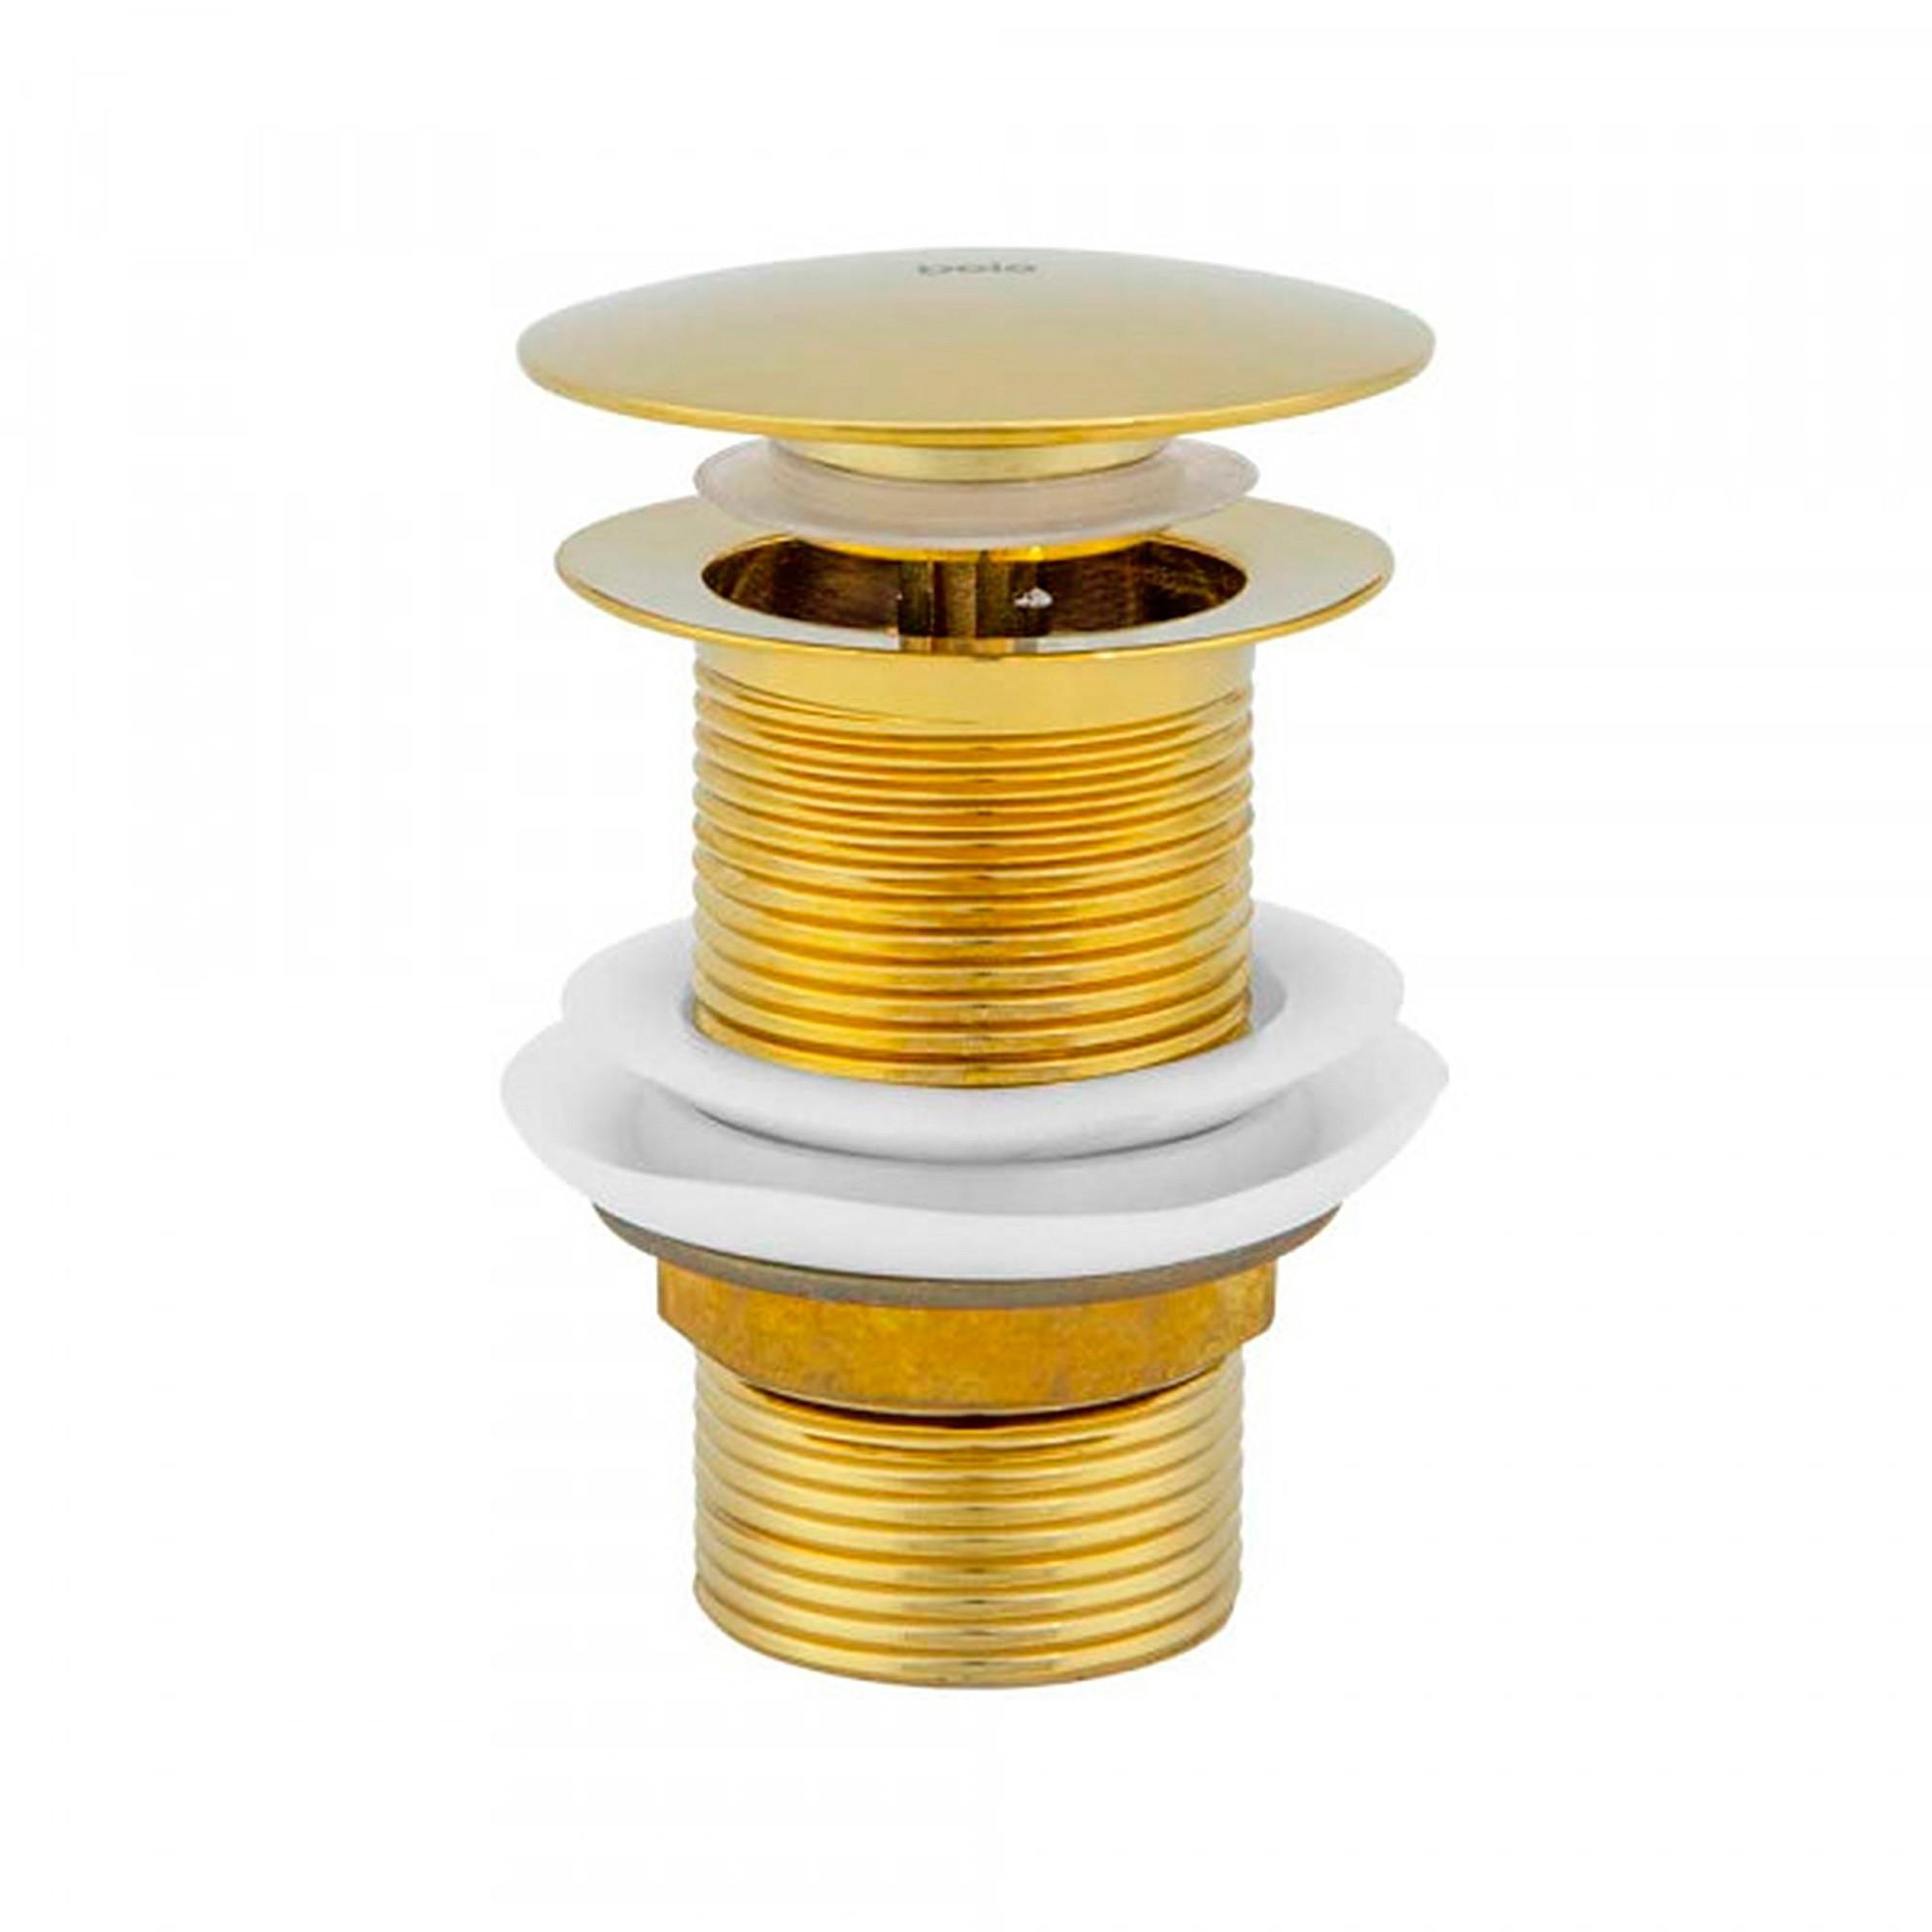 Válvula Click para Cubas Inox Dourada